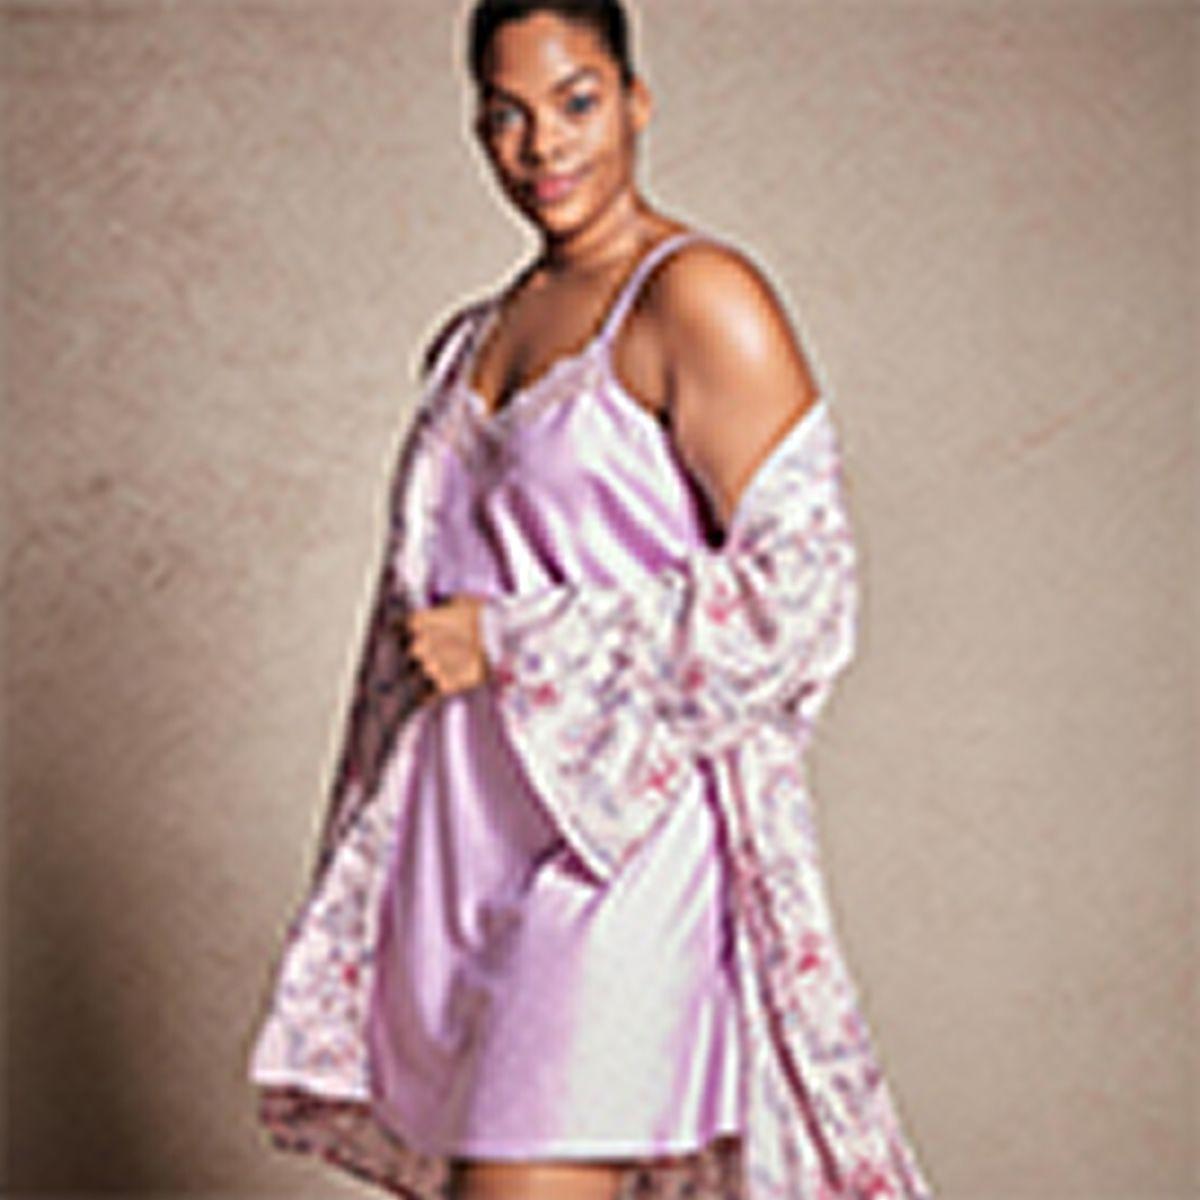 ecf486357c0 Walmart Women s Plus Size Tops Sales   Savings